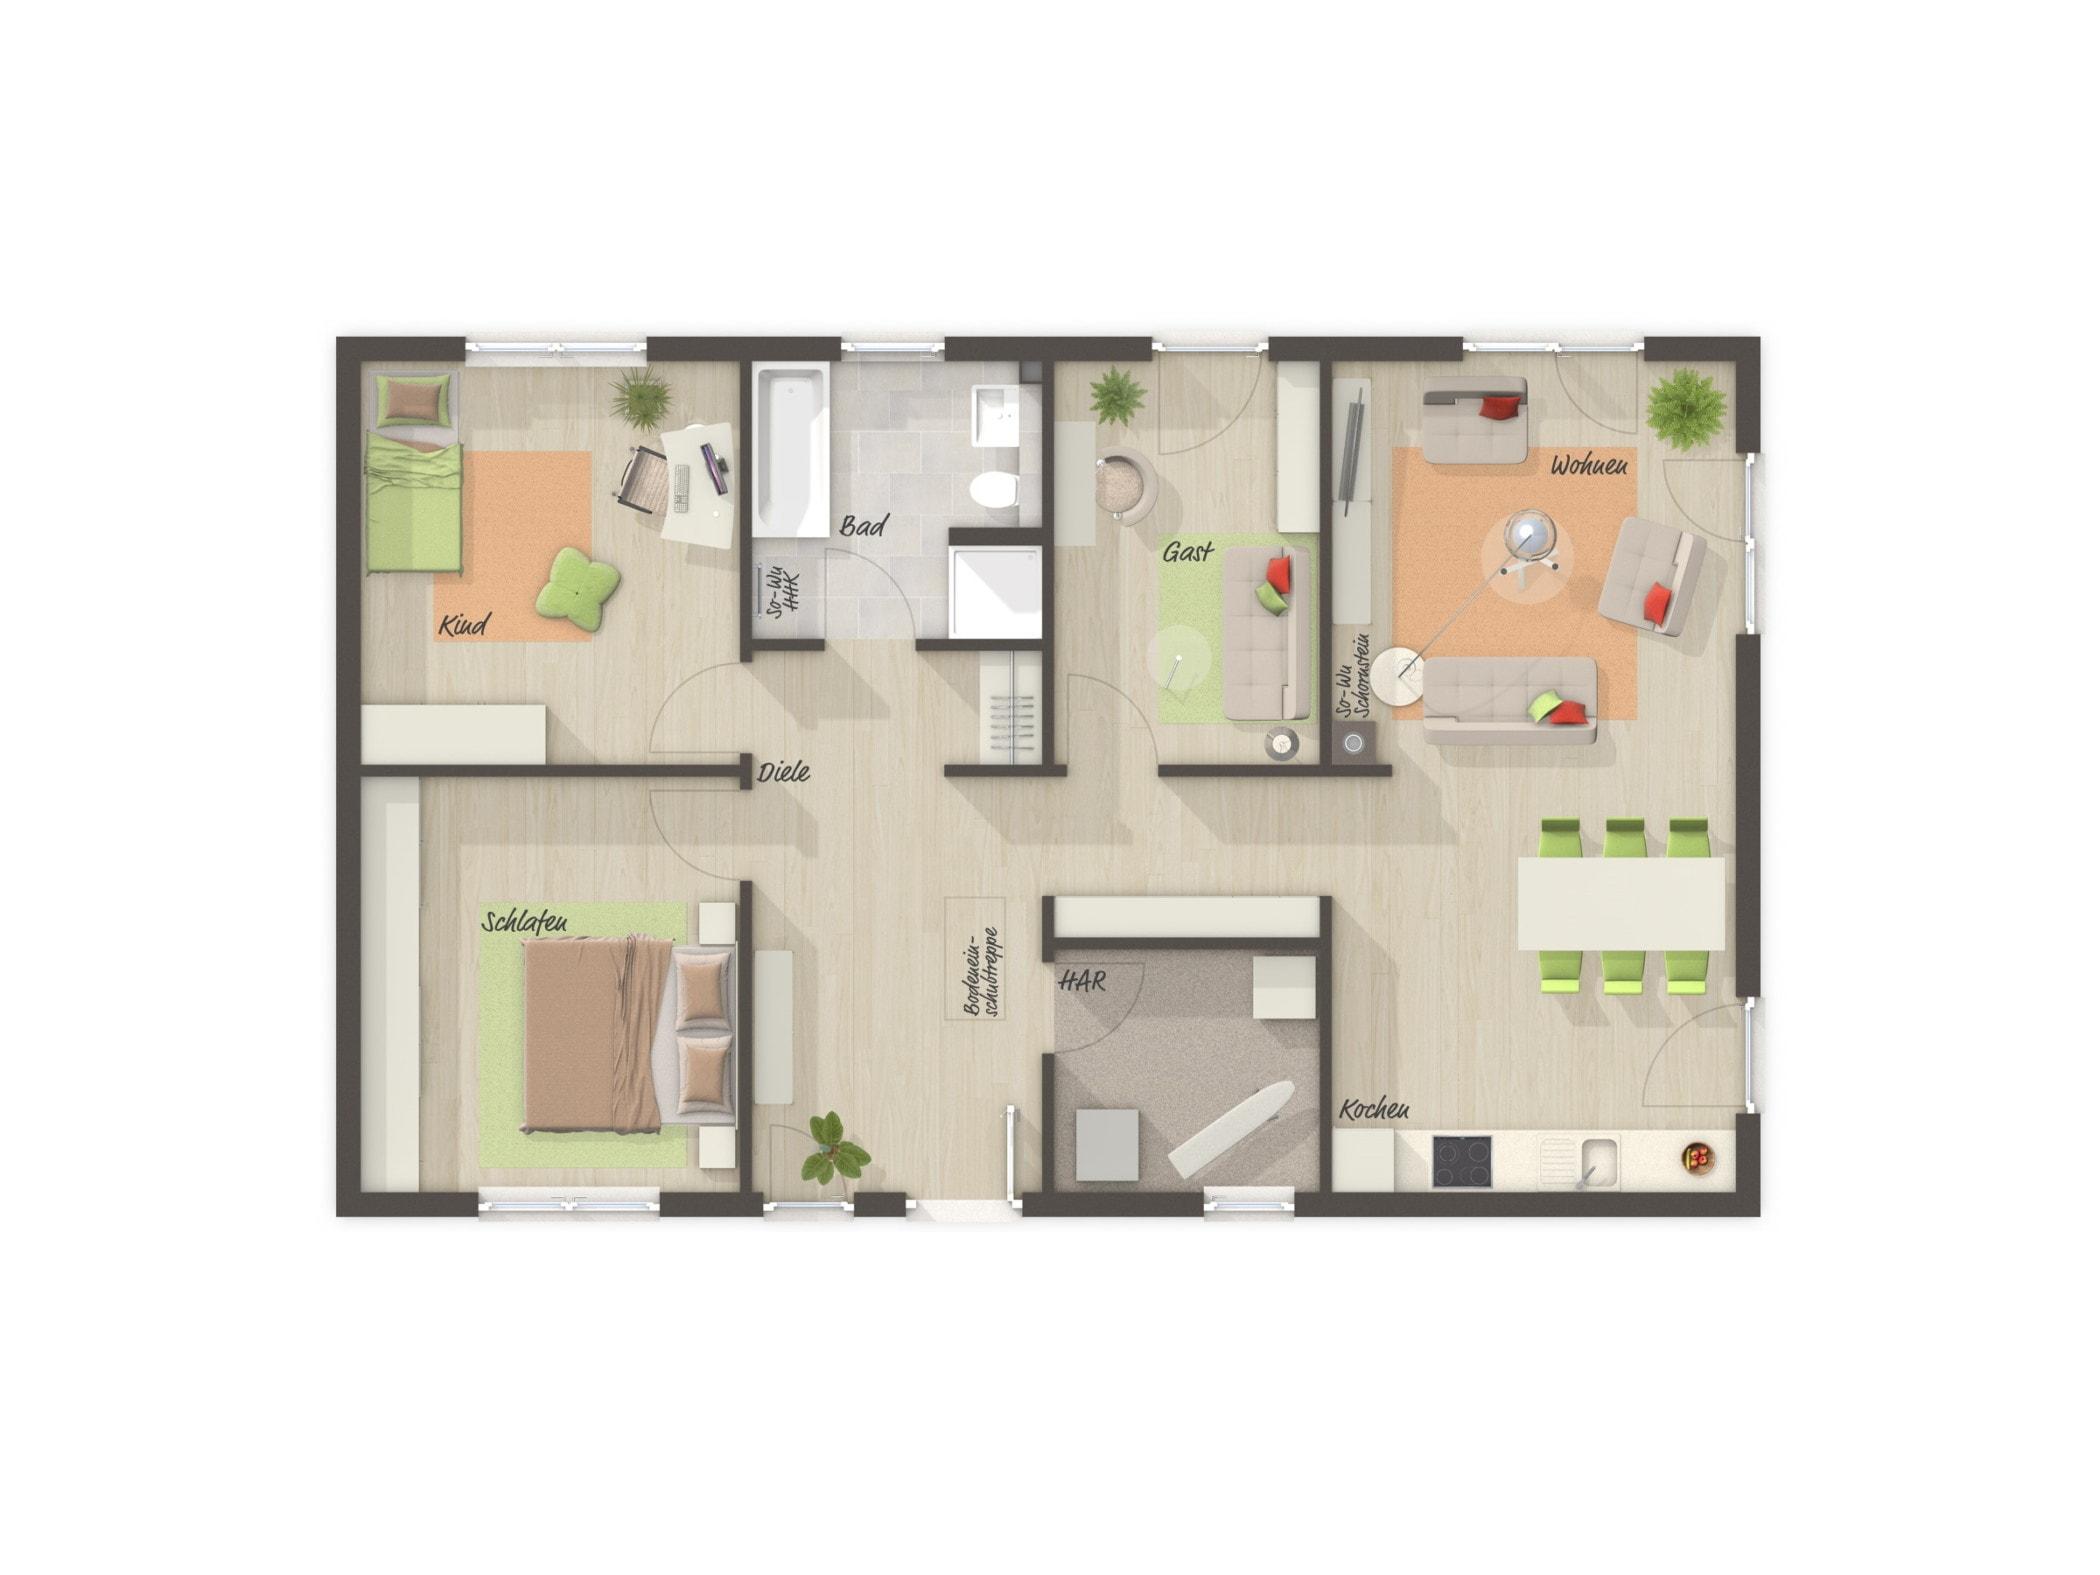 Bungalow Grundriss rechteckig mit Satteldach, 4 Zimmer, 100 qm - Massivhaus schlüsselfertig bauen Ideen Town Country Haus BUNGALOW 100 - HausbauDirekt.de